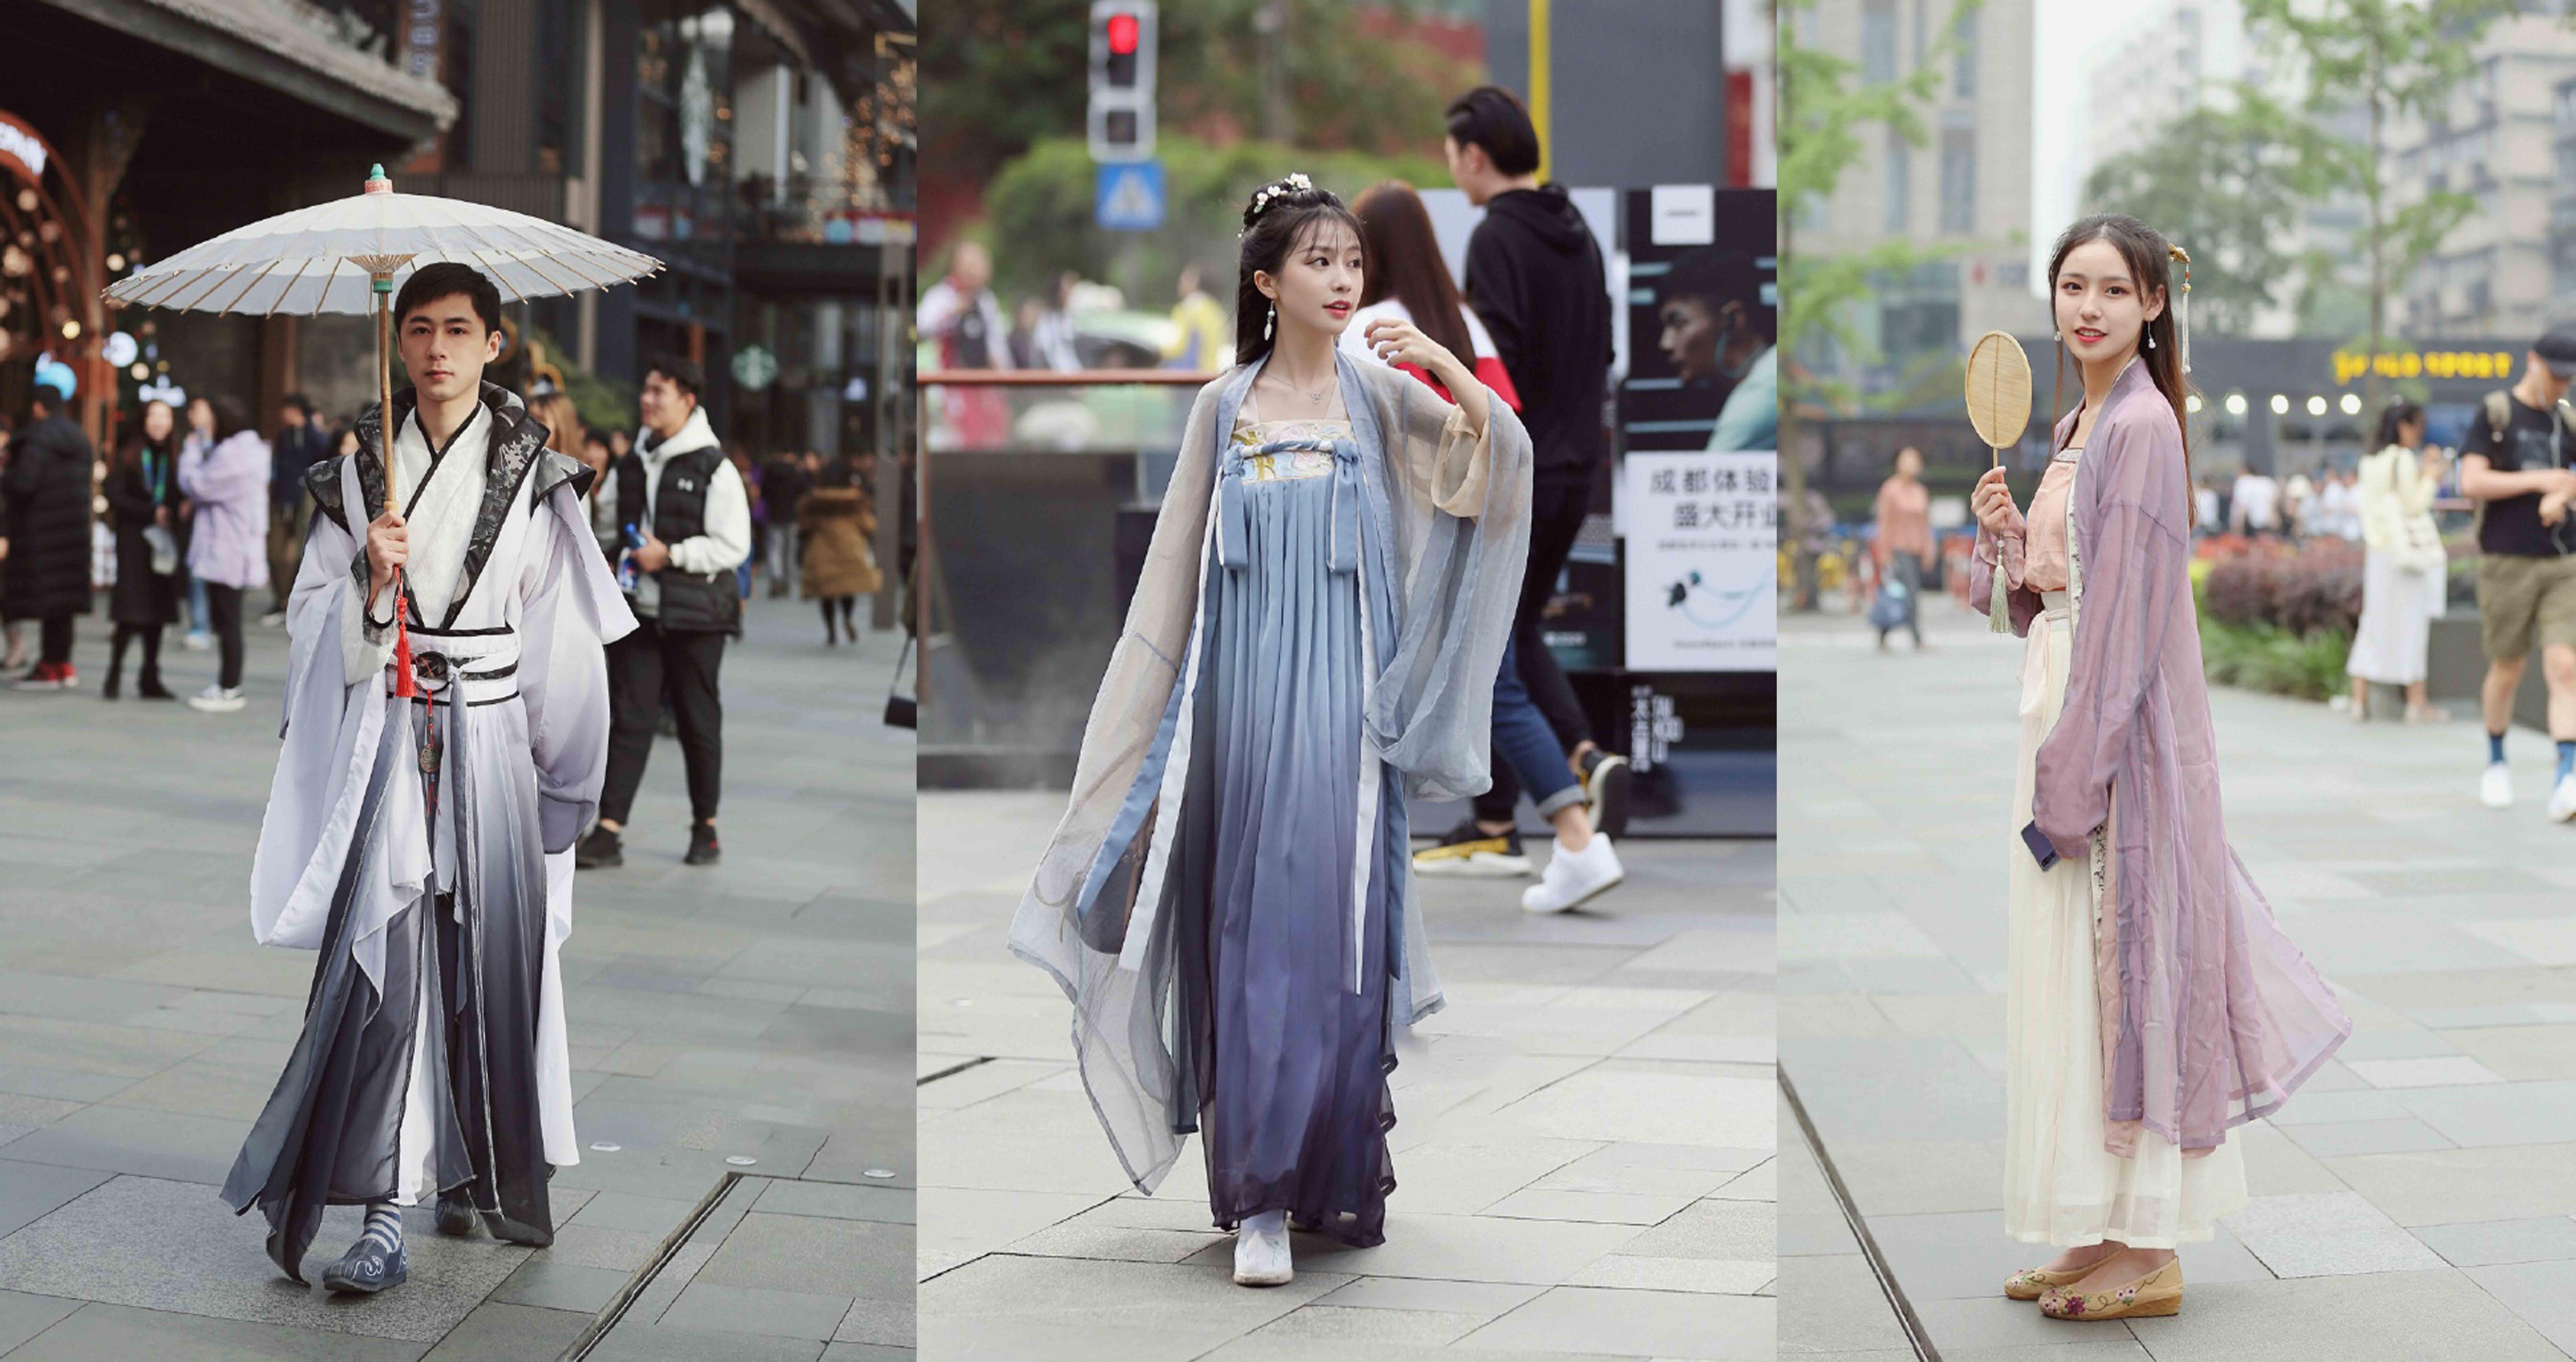 Hanfu streetstyle shot by Weibo user @她街拍 | Source: Weibo @她街拍